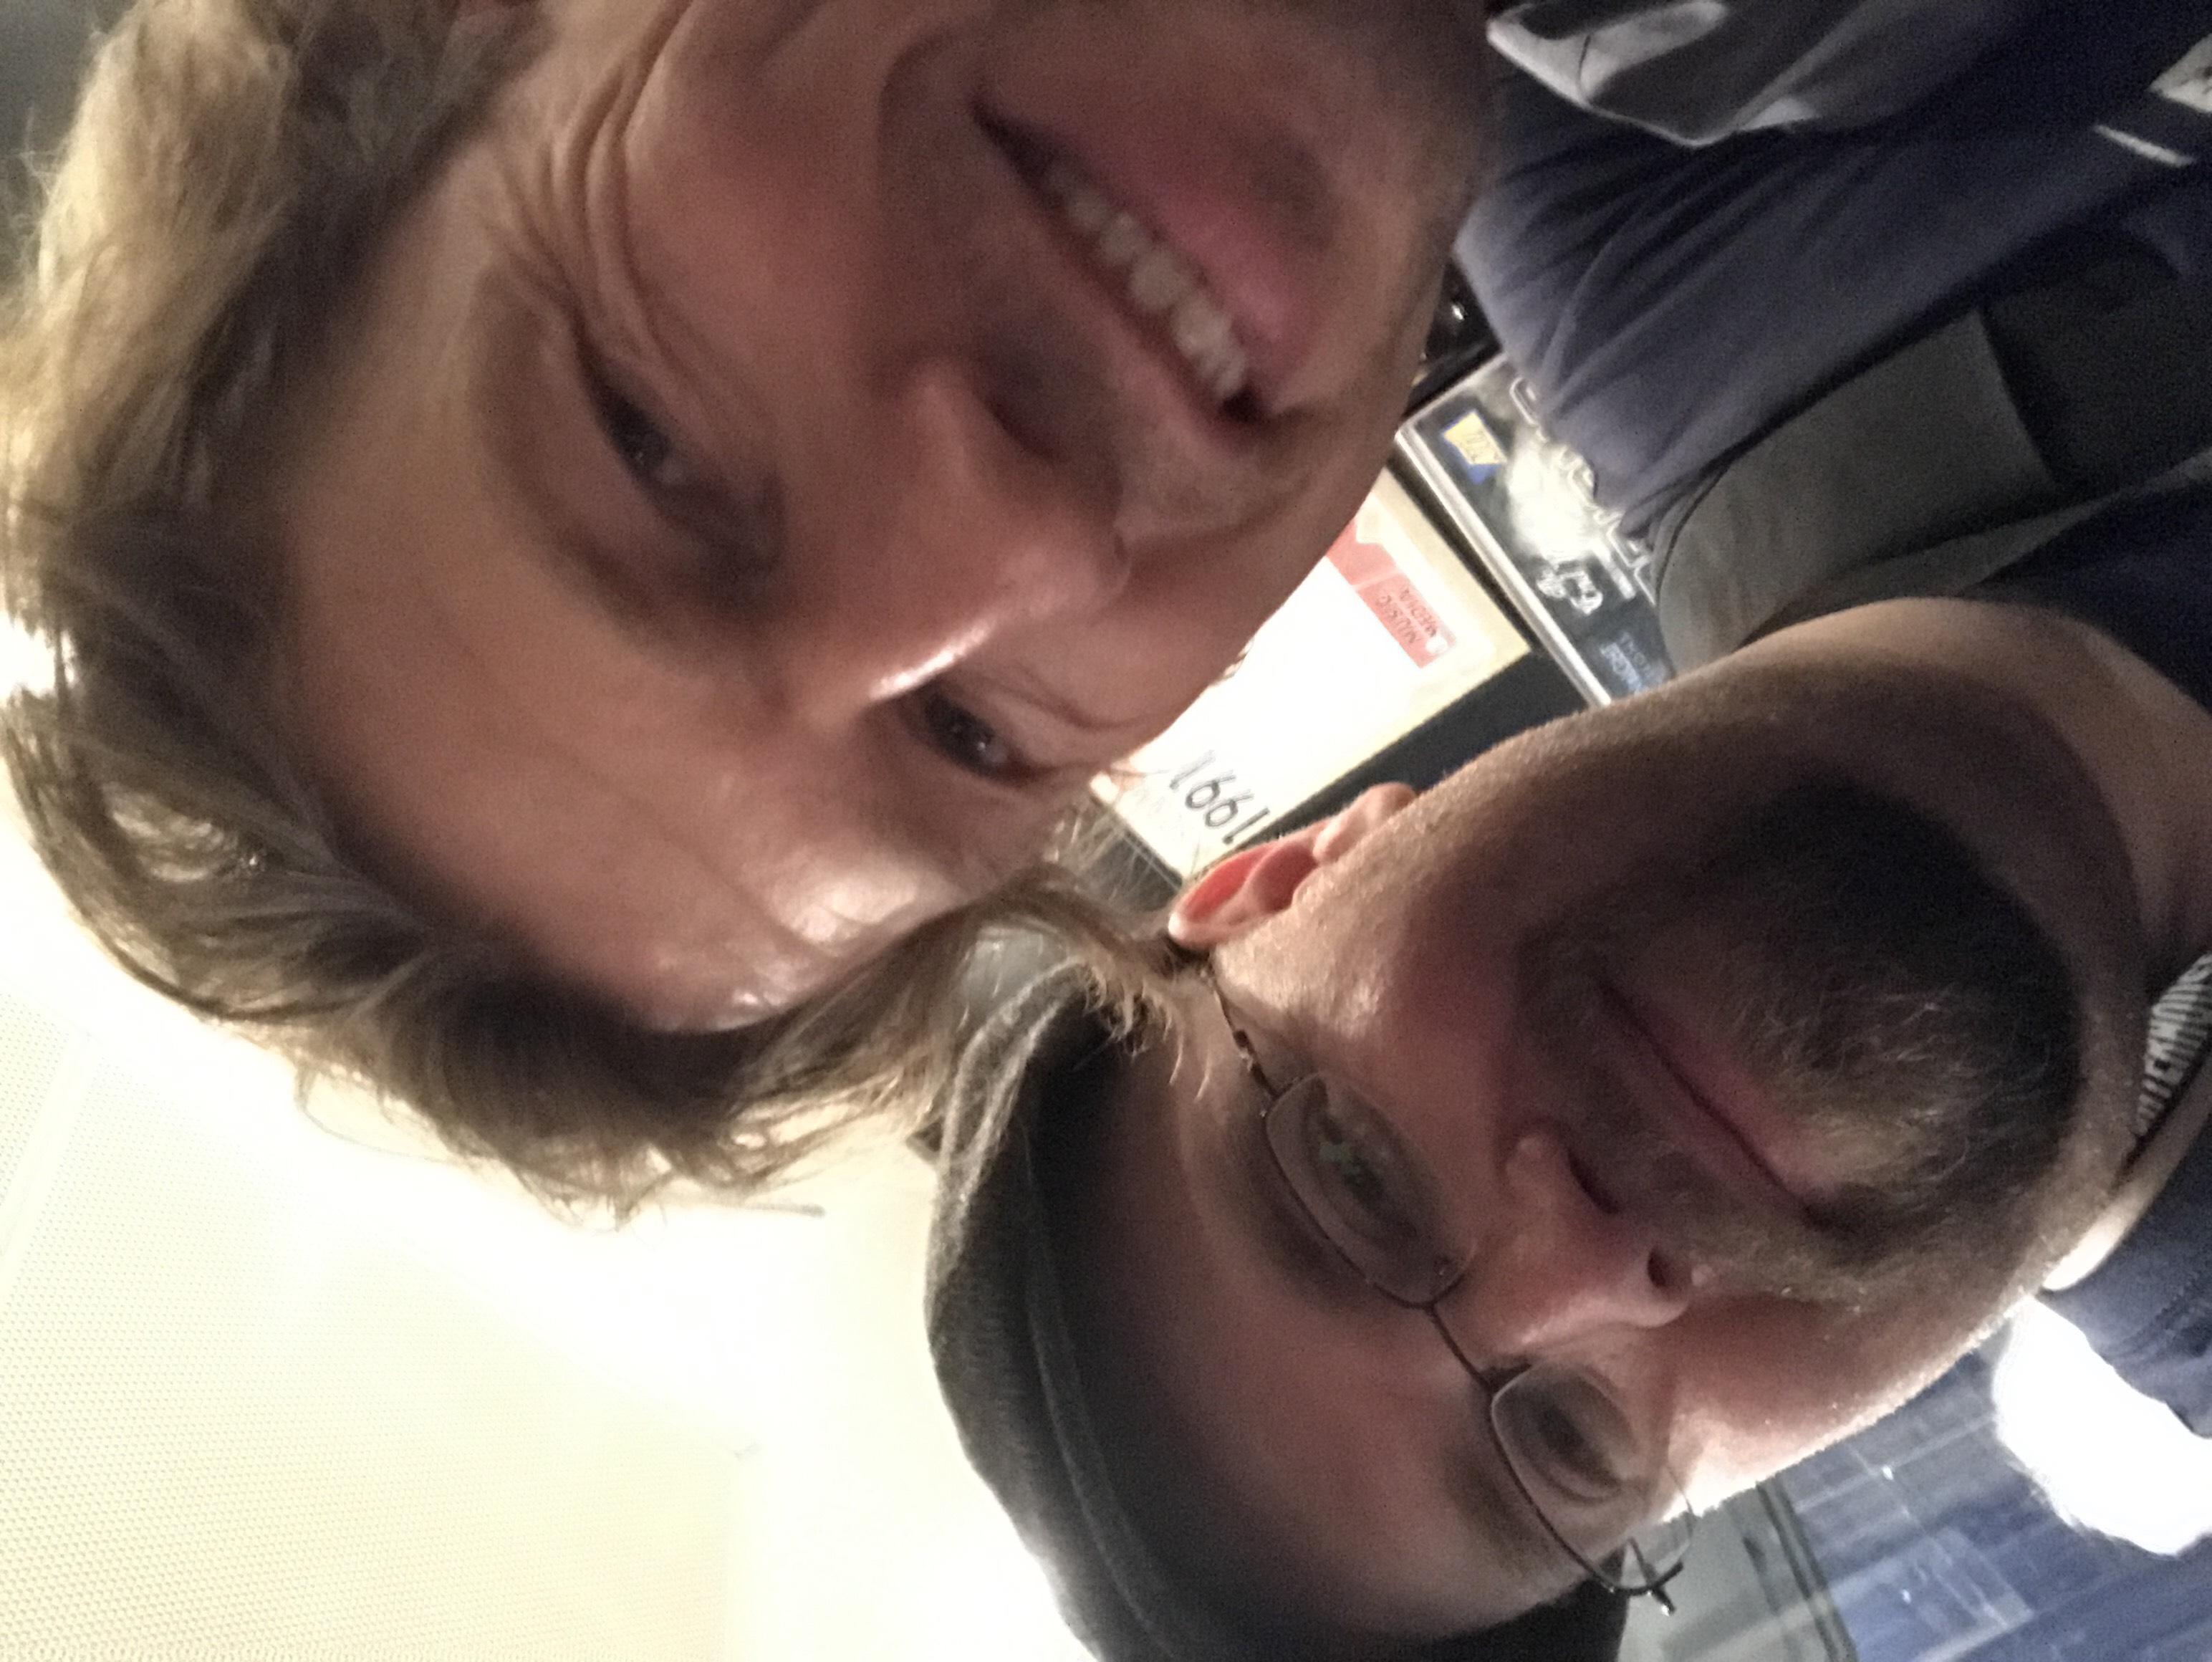 Rainer and I